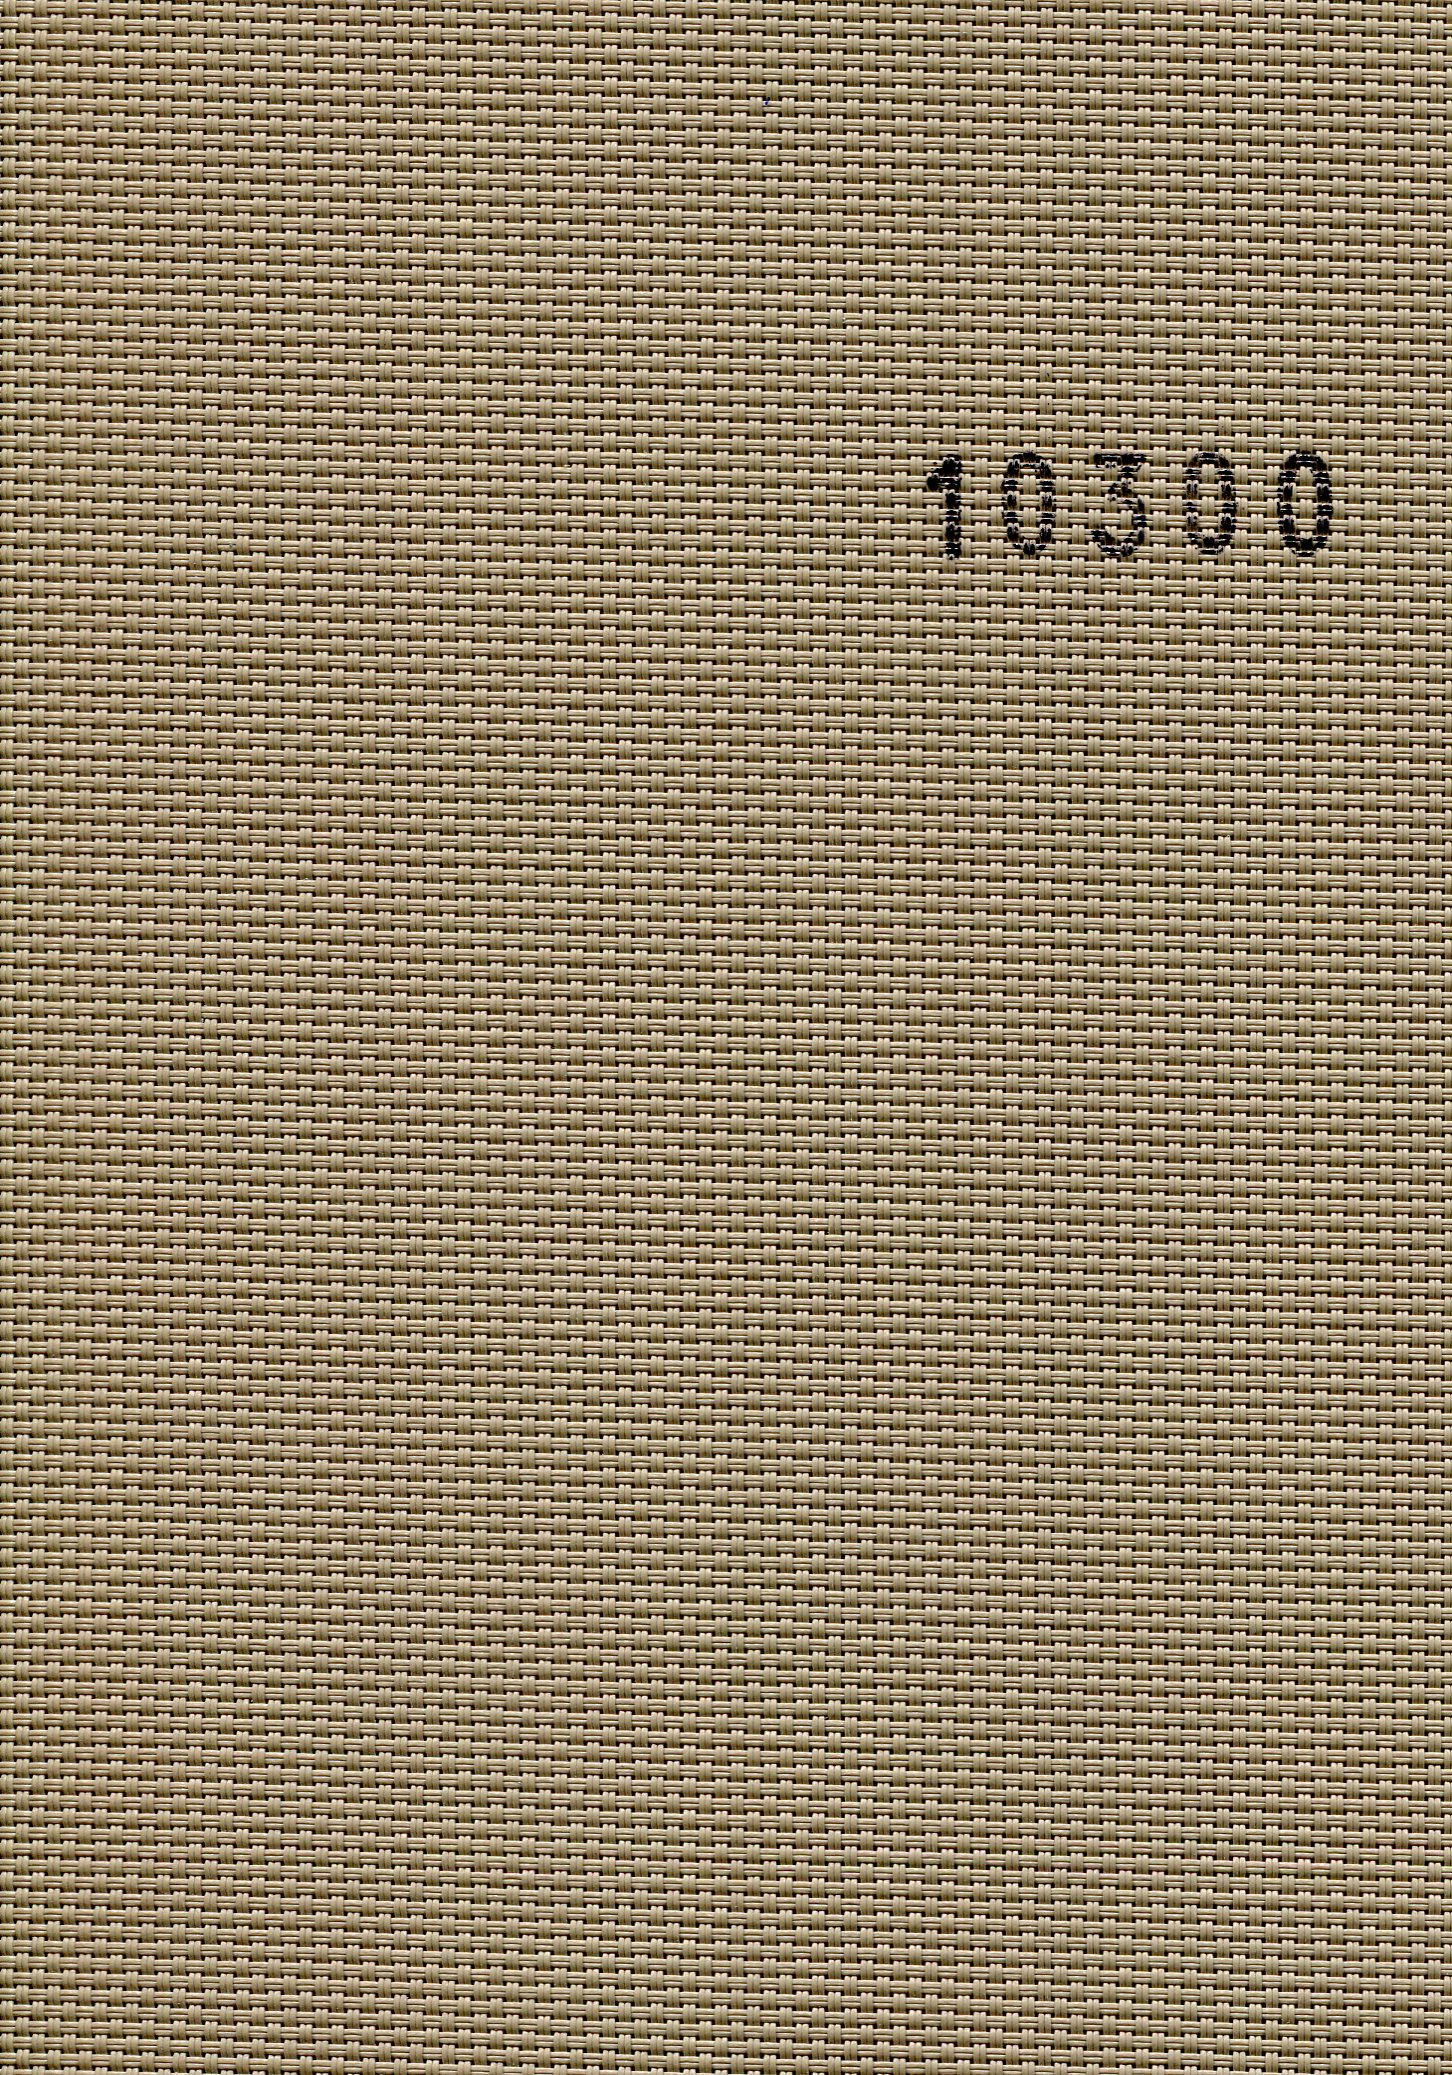 Screen 10300